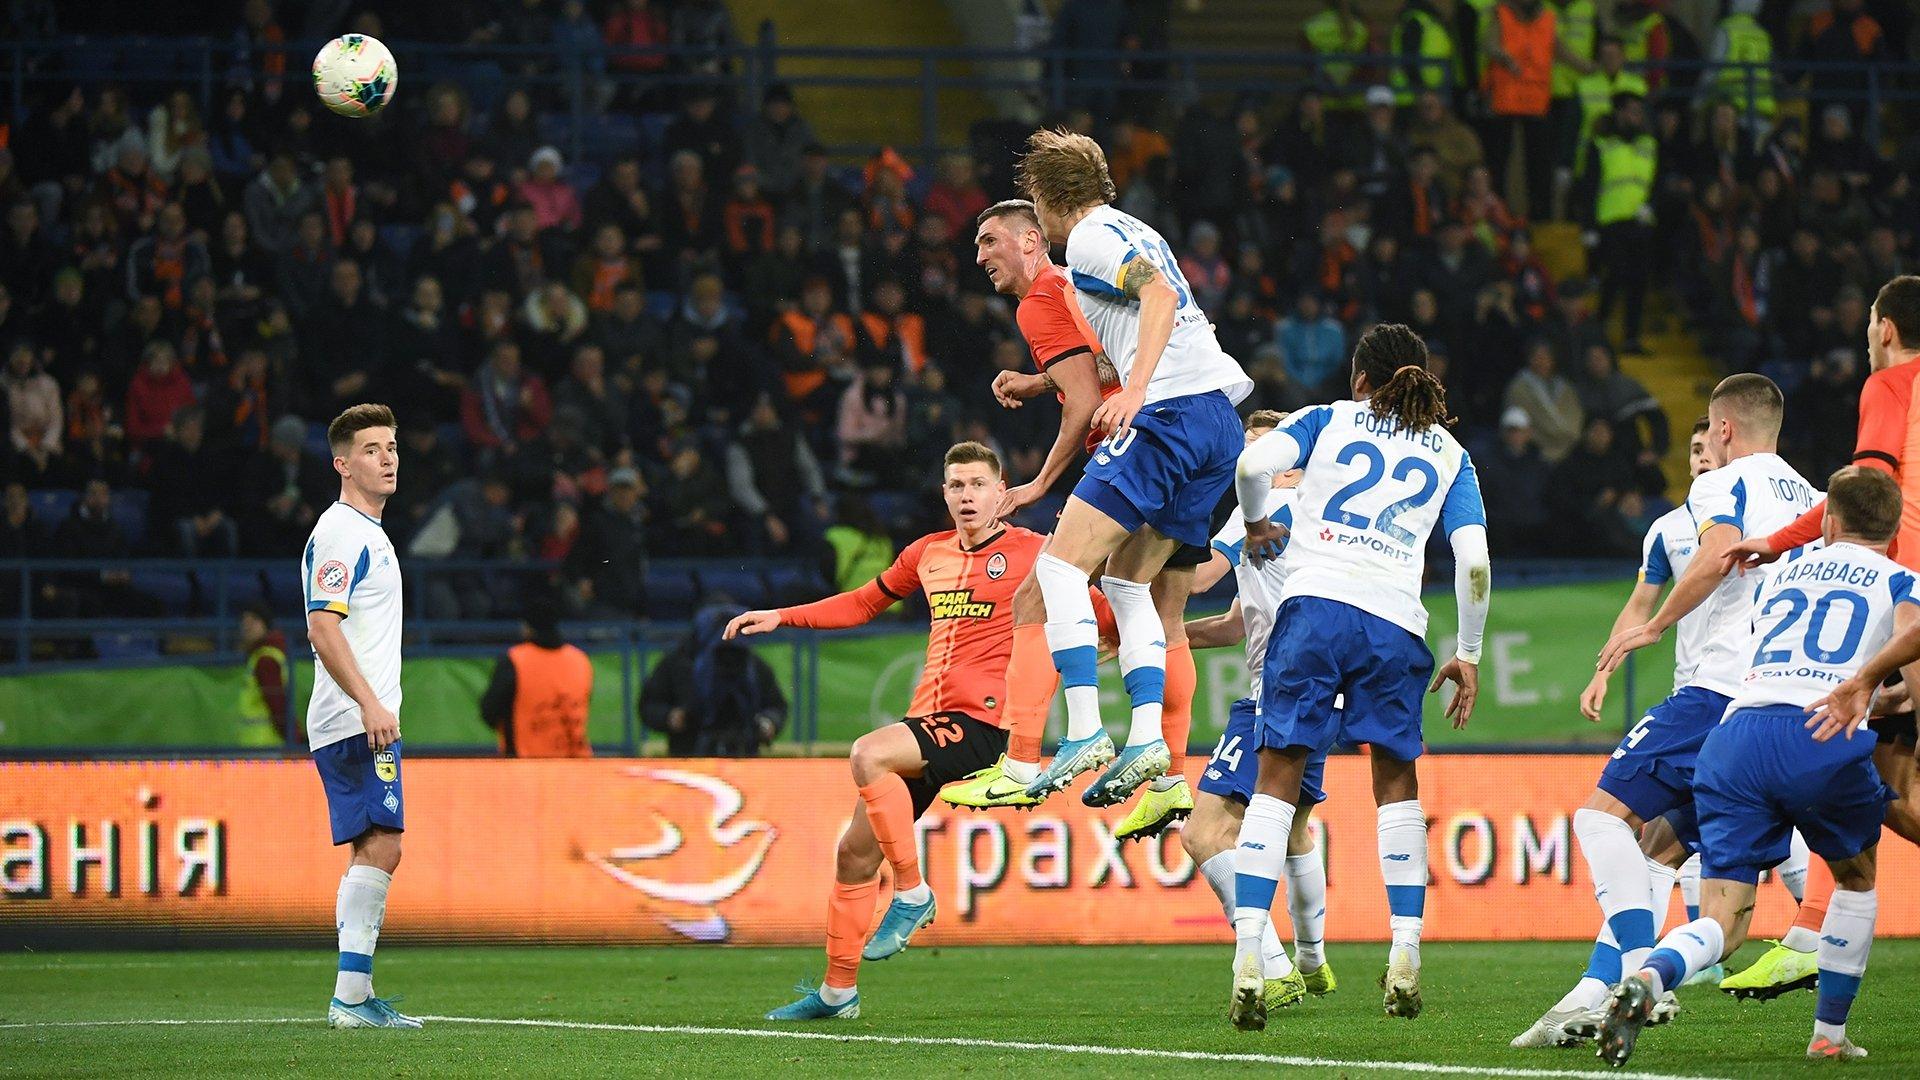 Шахтер Динамо 1:0 реакция Михайличенко 2